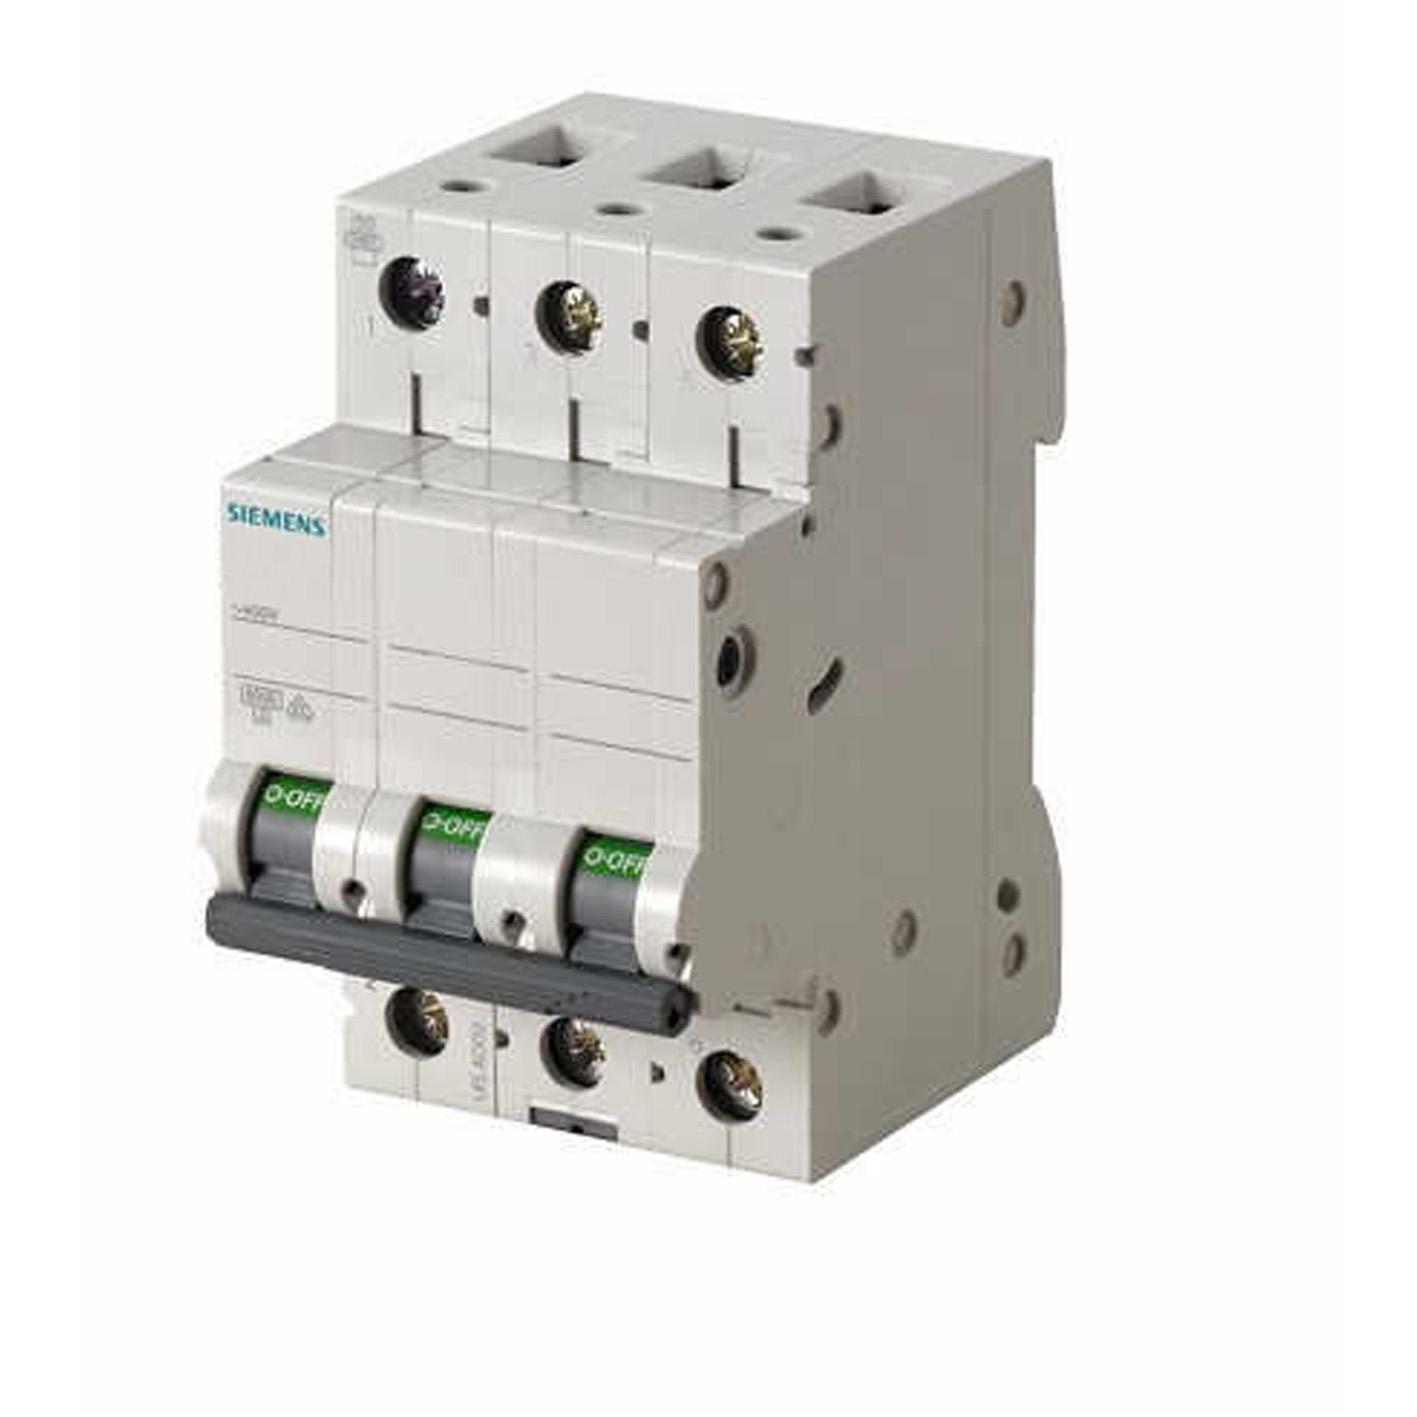 Siemens 3x32A Otomatik Sigorta